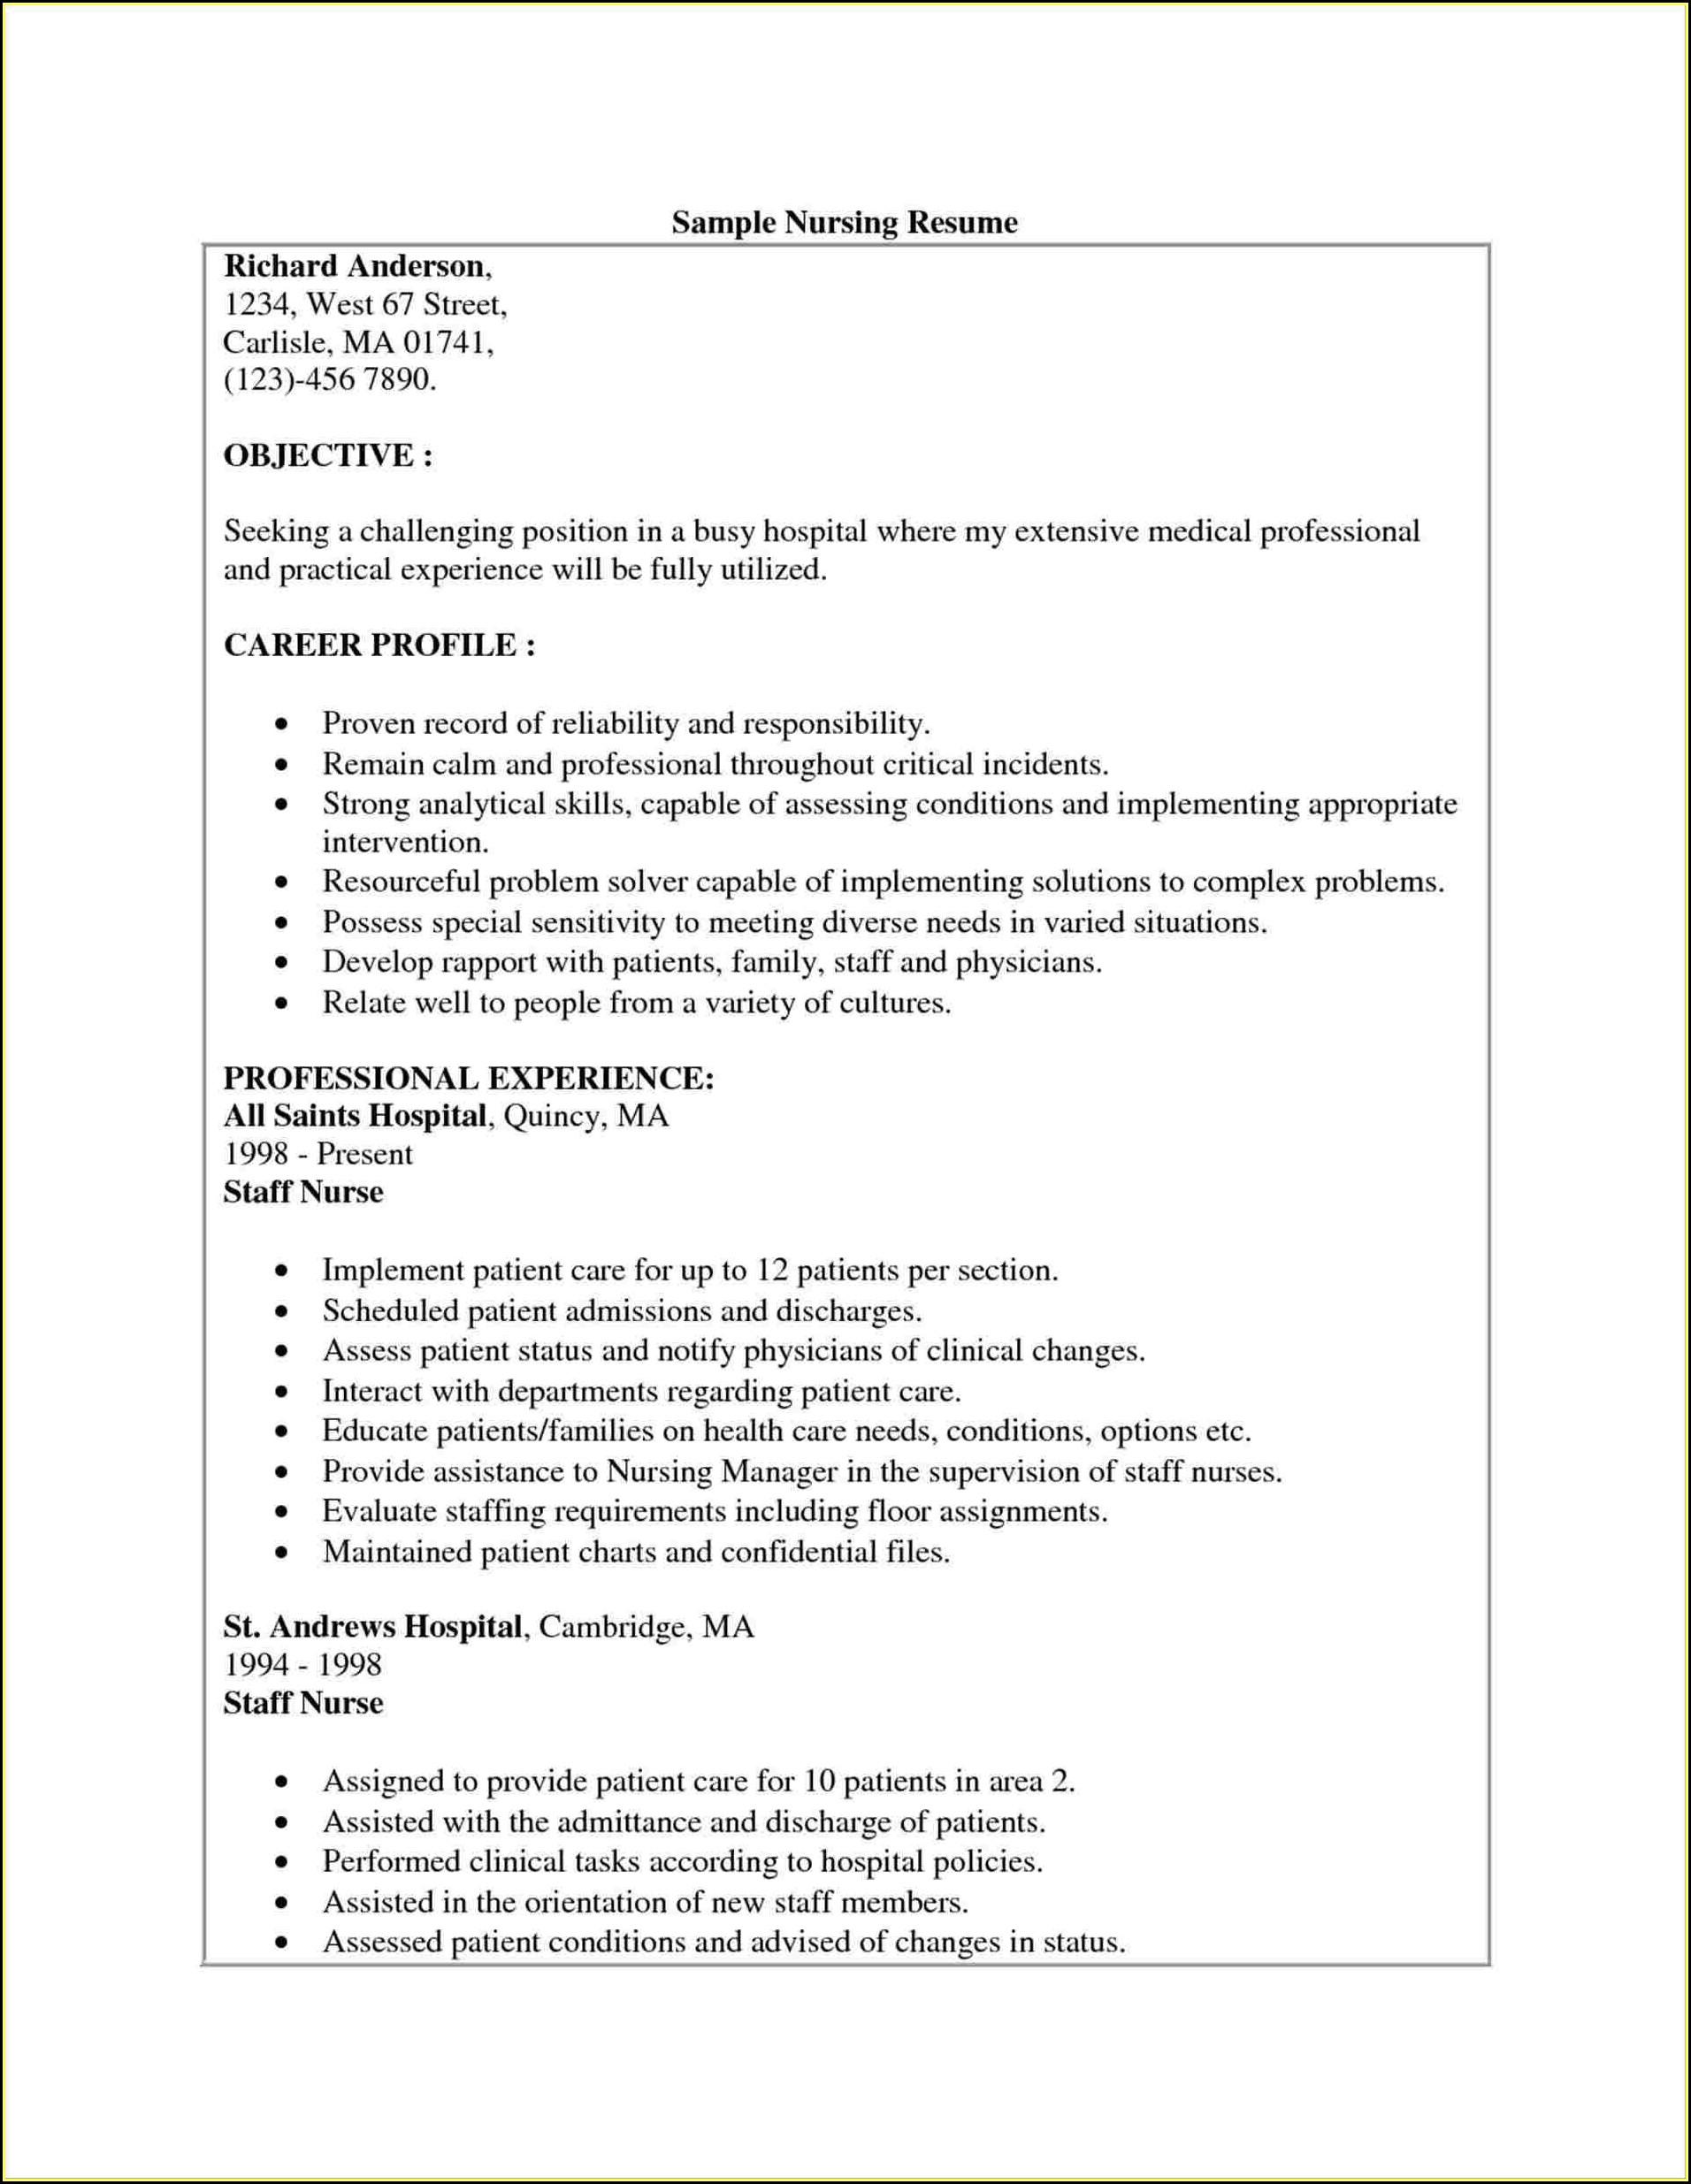 Examples Of Nursing Resume Templates